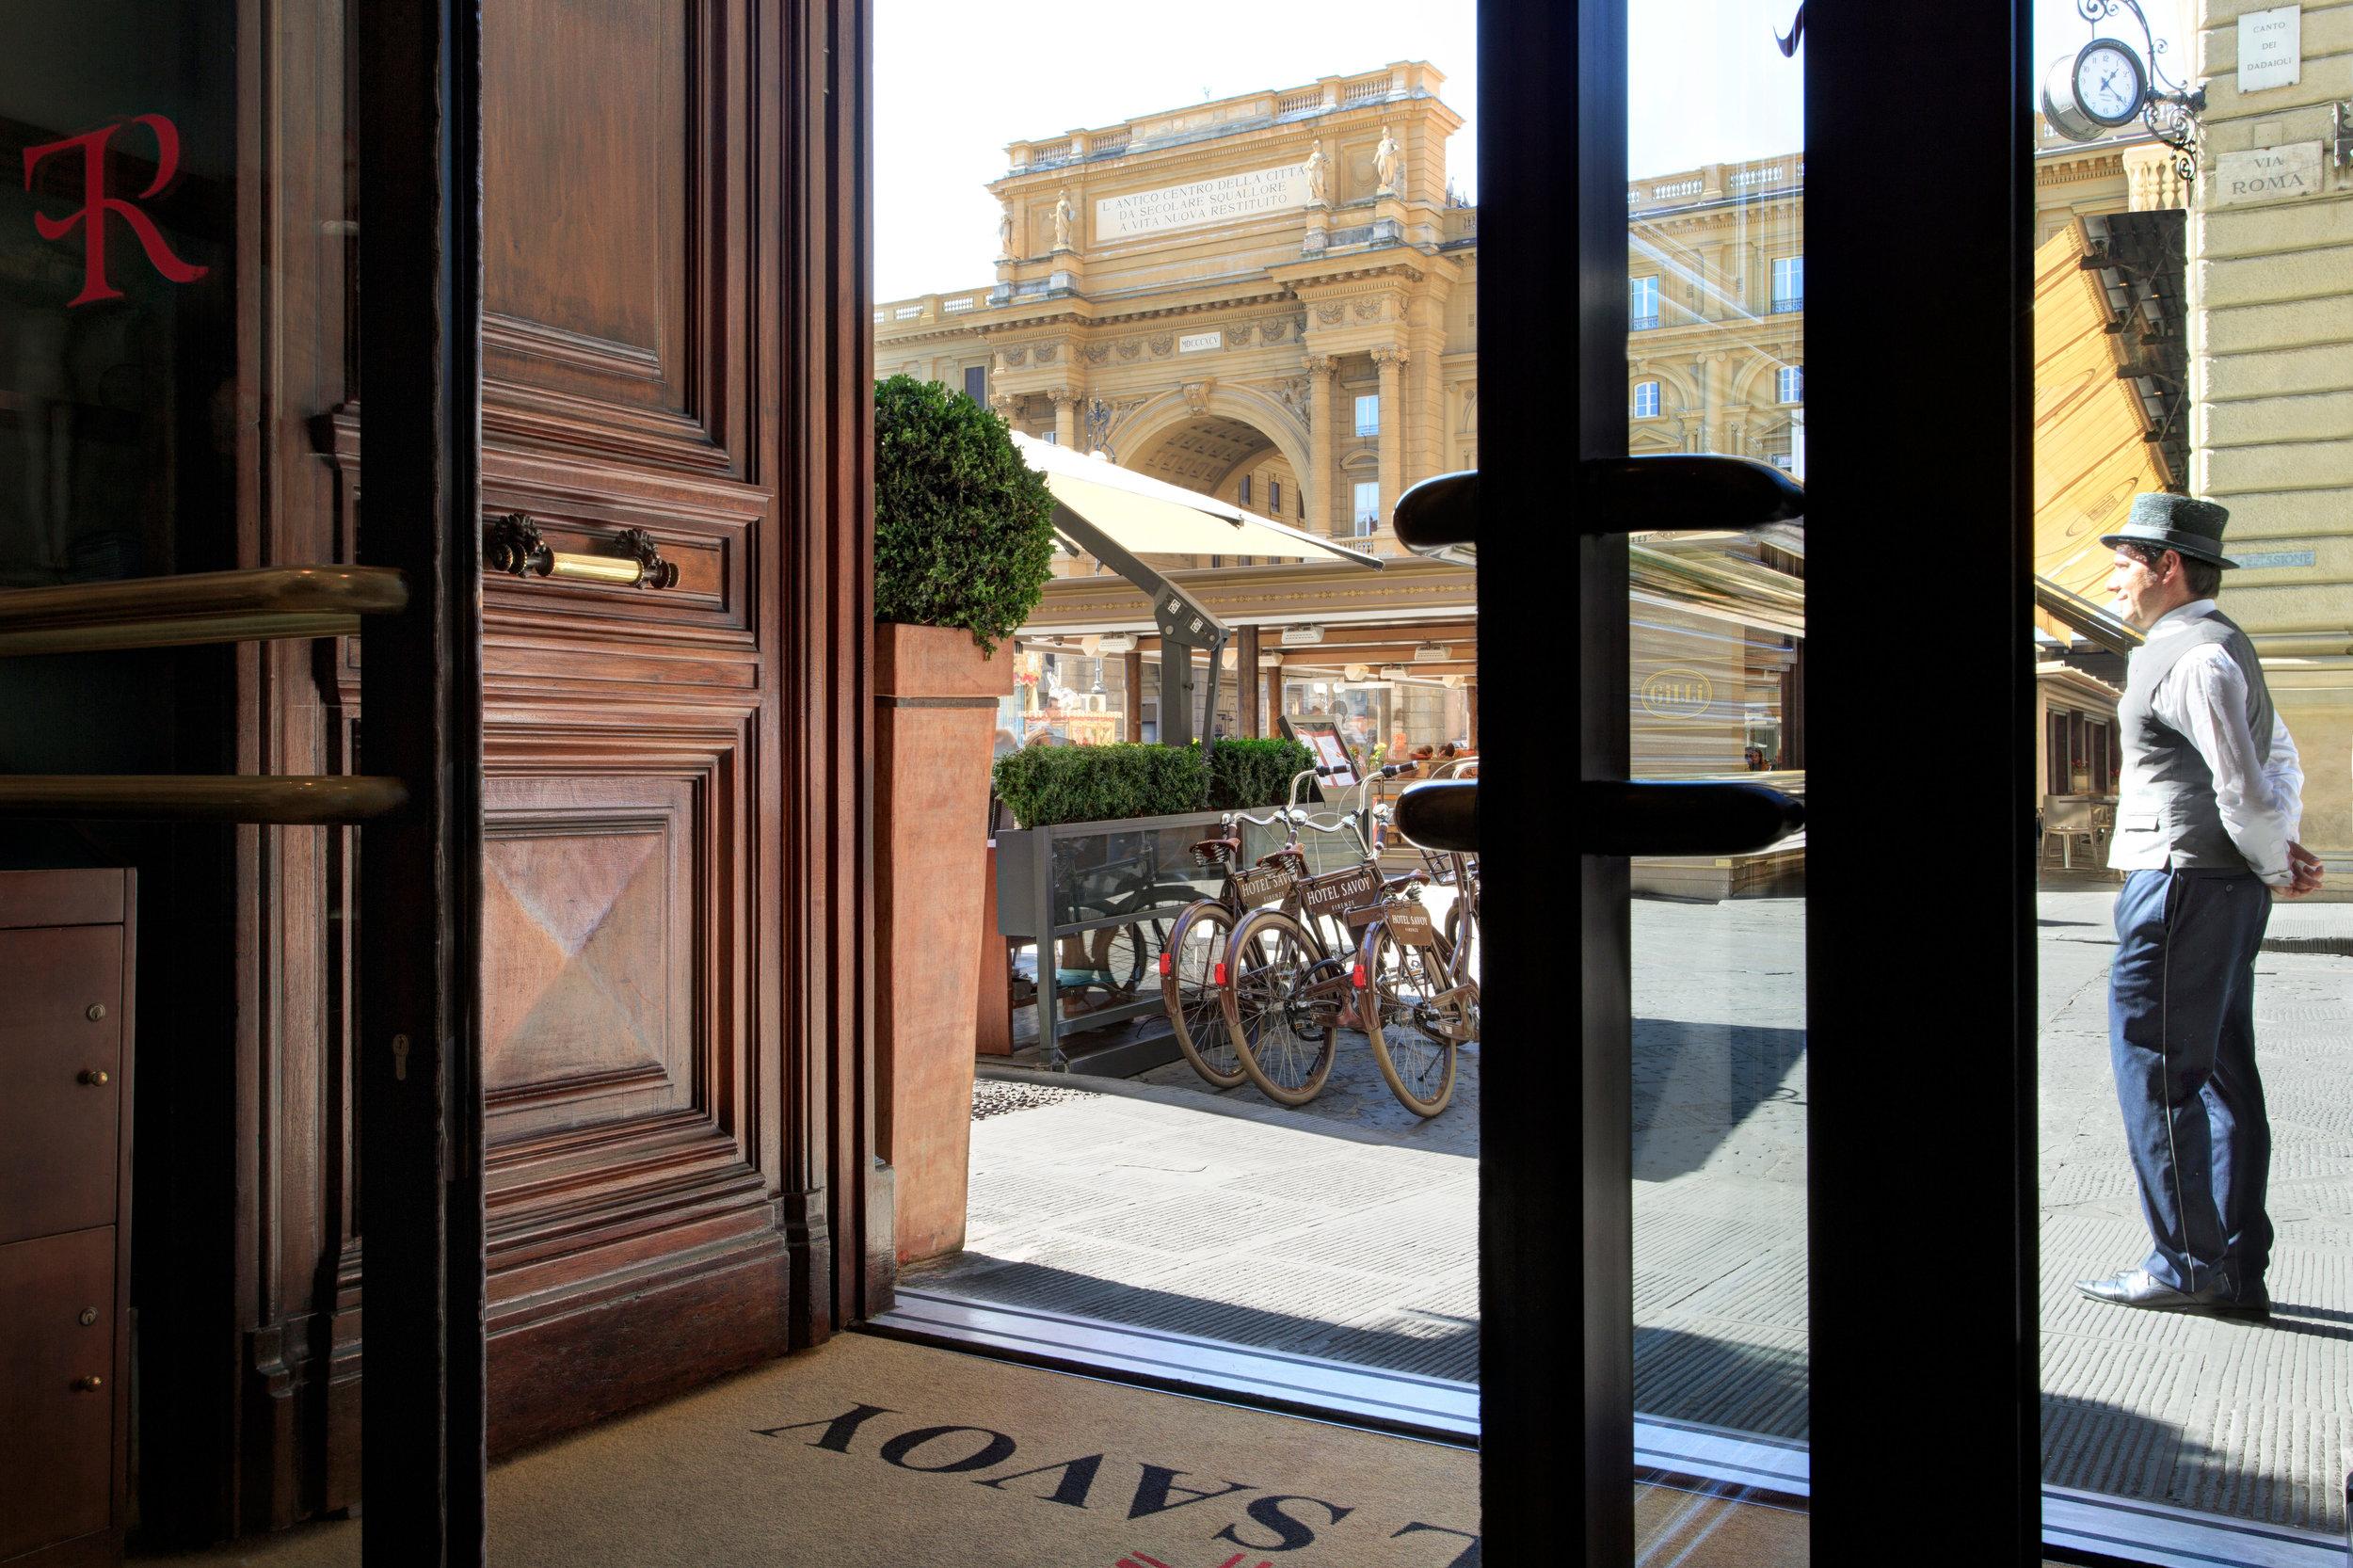 9 RFH Hotel Savoy - Entrance Detail 3345R JG Oct 16.JPG